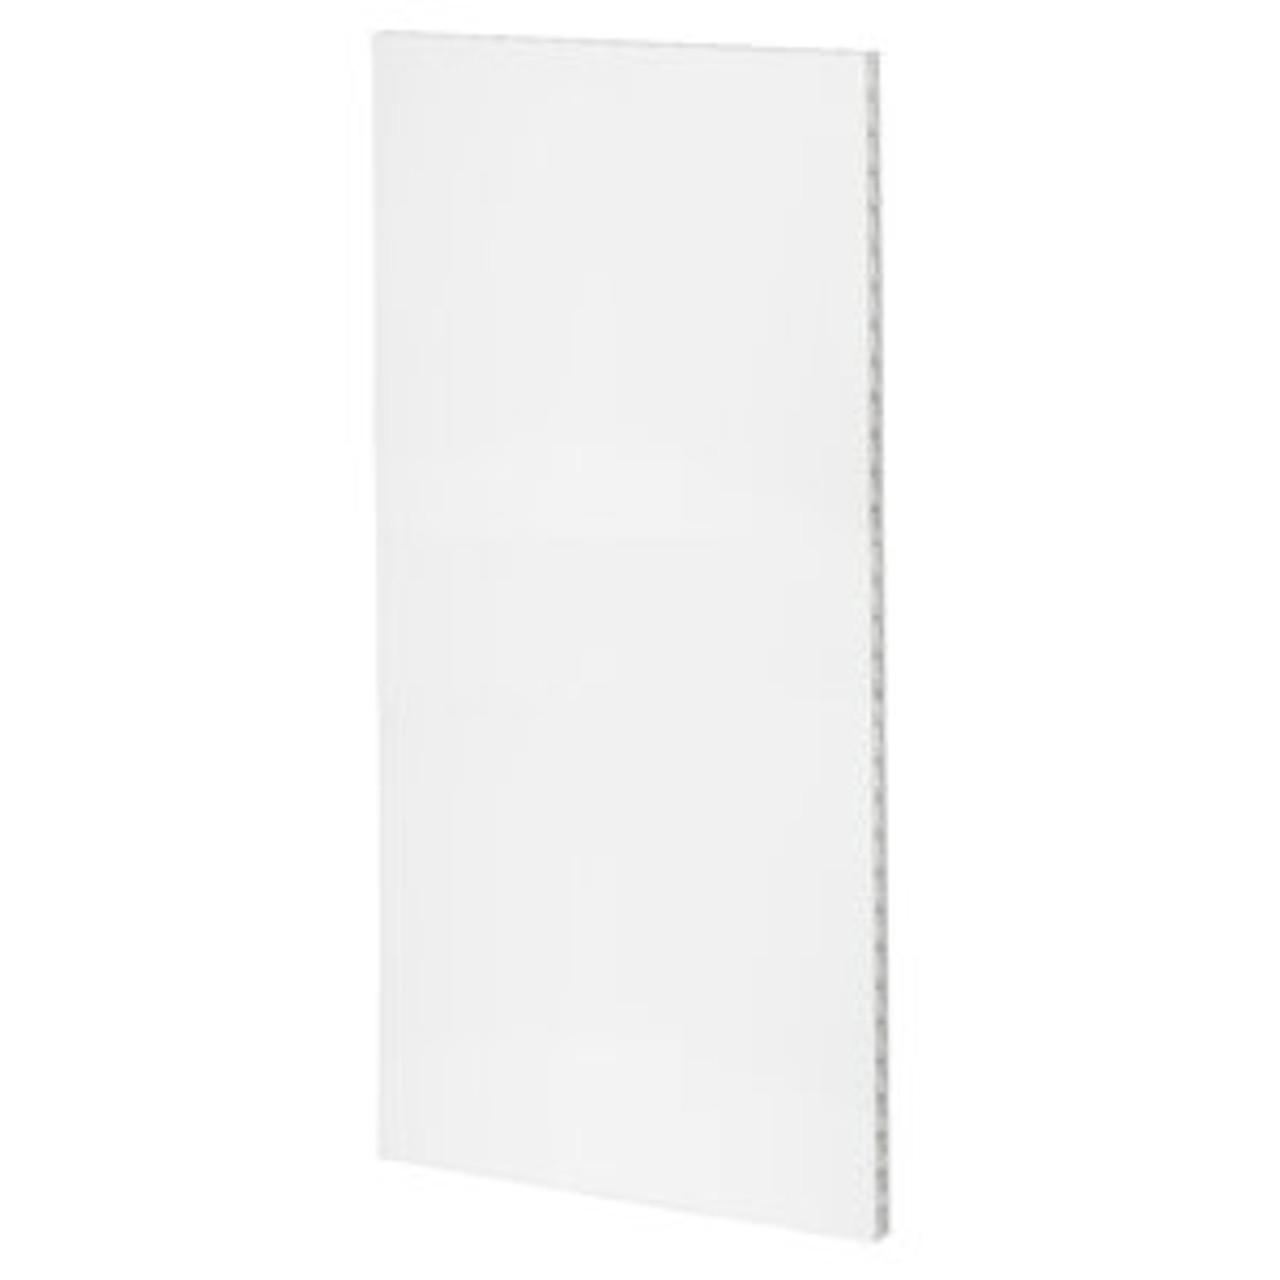 EverPanel 8' x 4' Panel